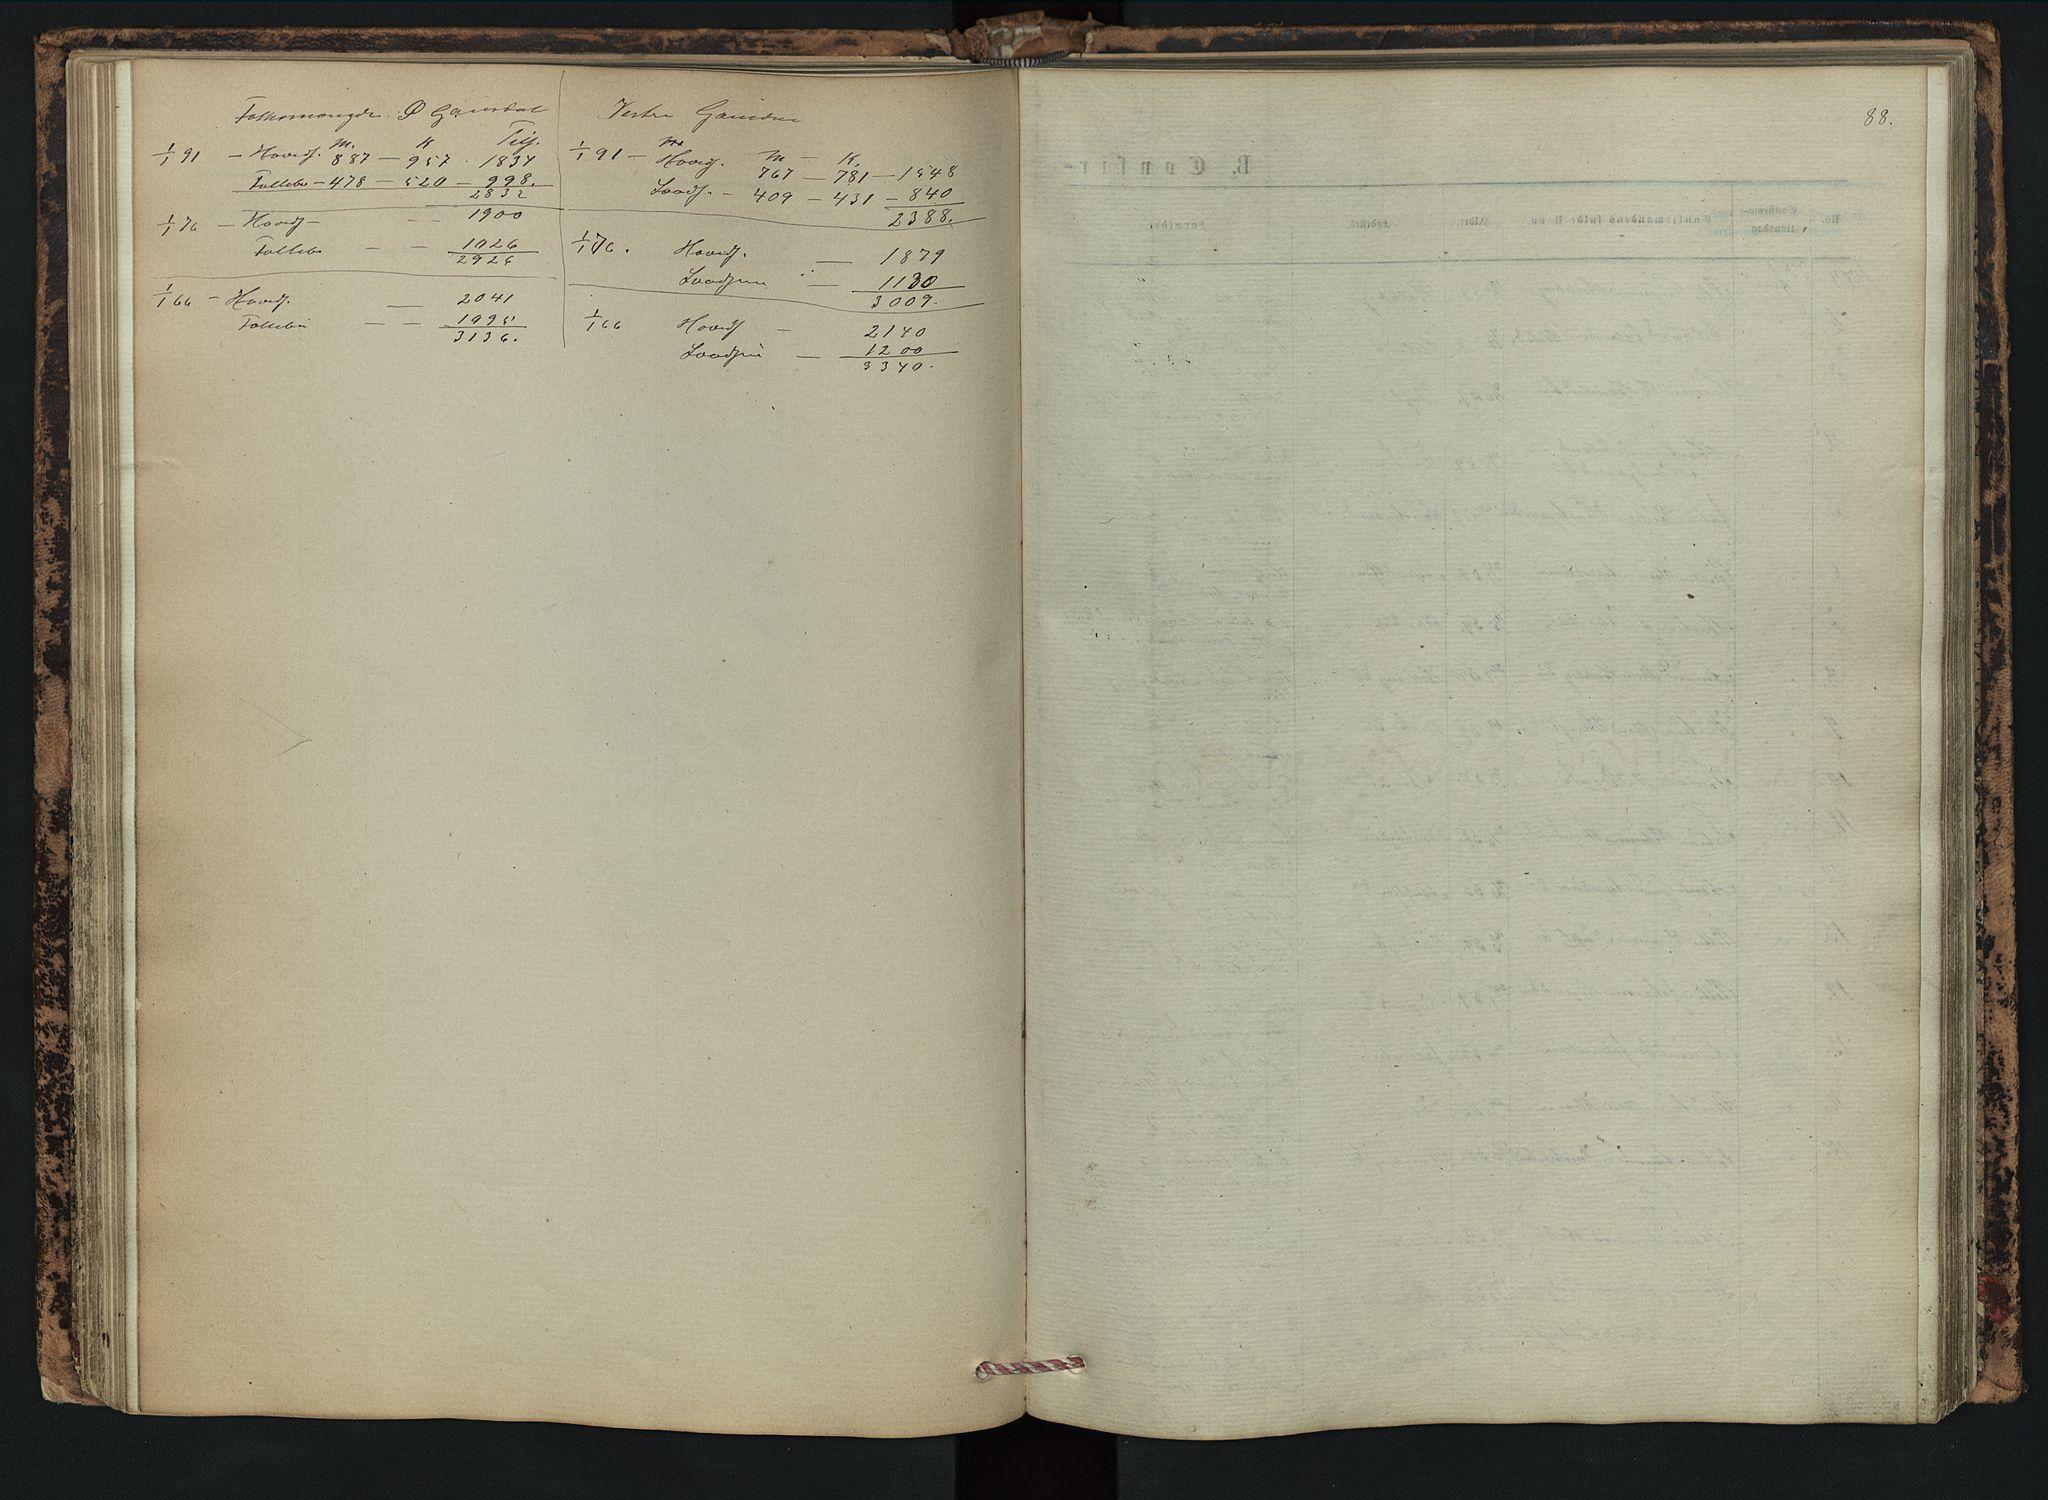 SAH, Vestre Gausdal prestekontor, Klokkerbok nr. 2, 1874-1897, s. 88